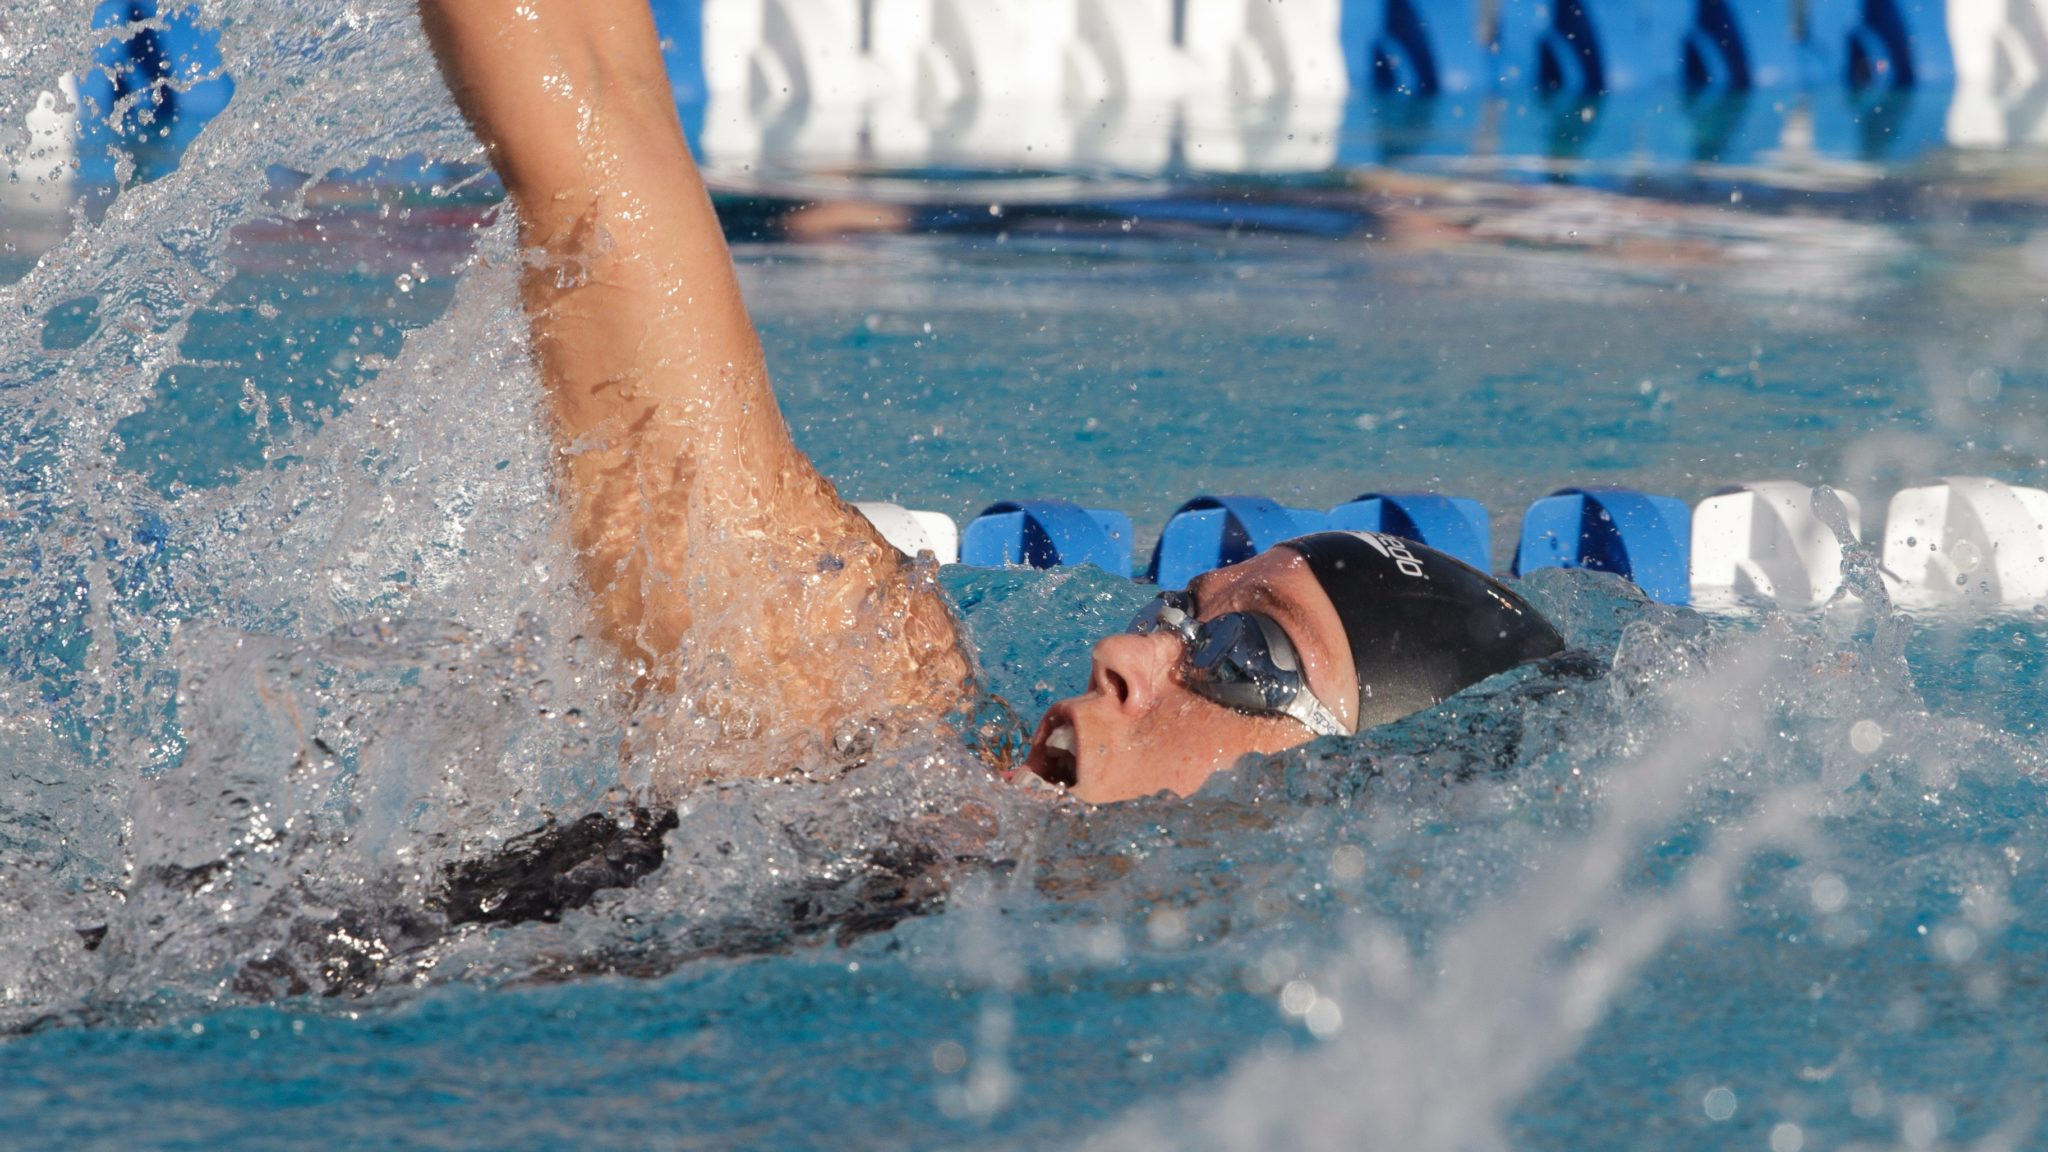 Natalie Coughlin Swims 1 In 100 Backstroke Time Trial At Arena Pro Swim Charlotte